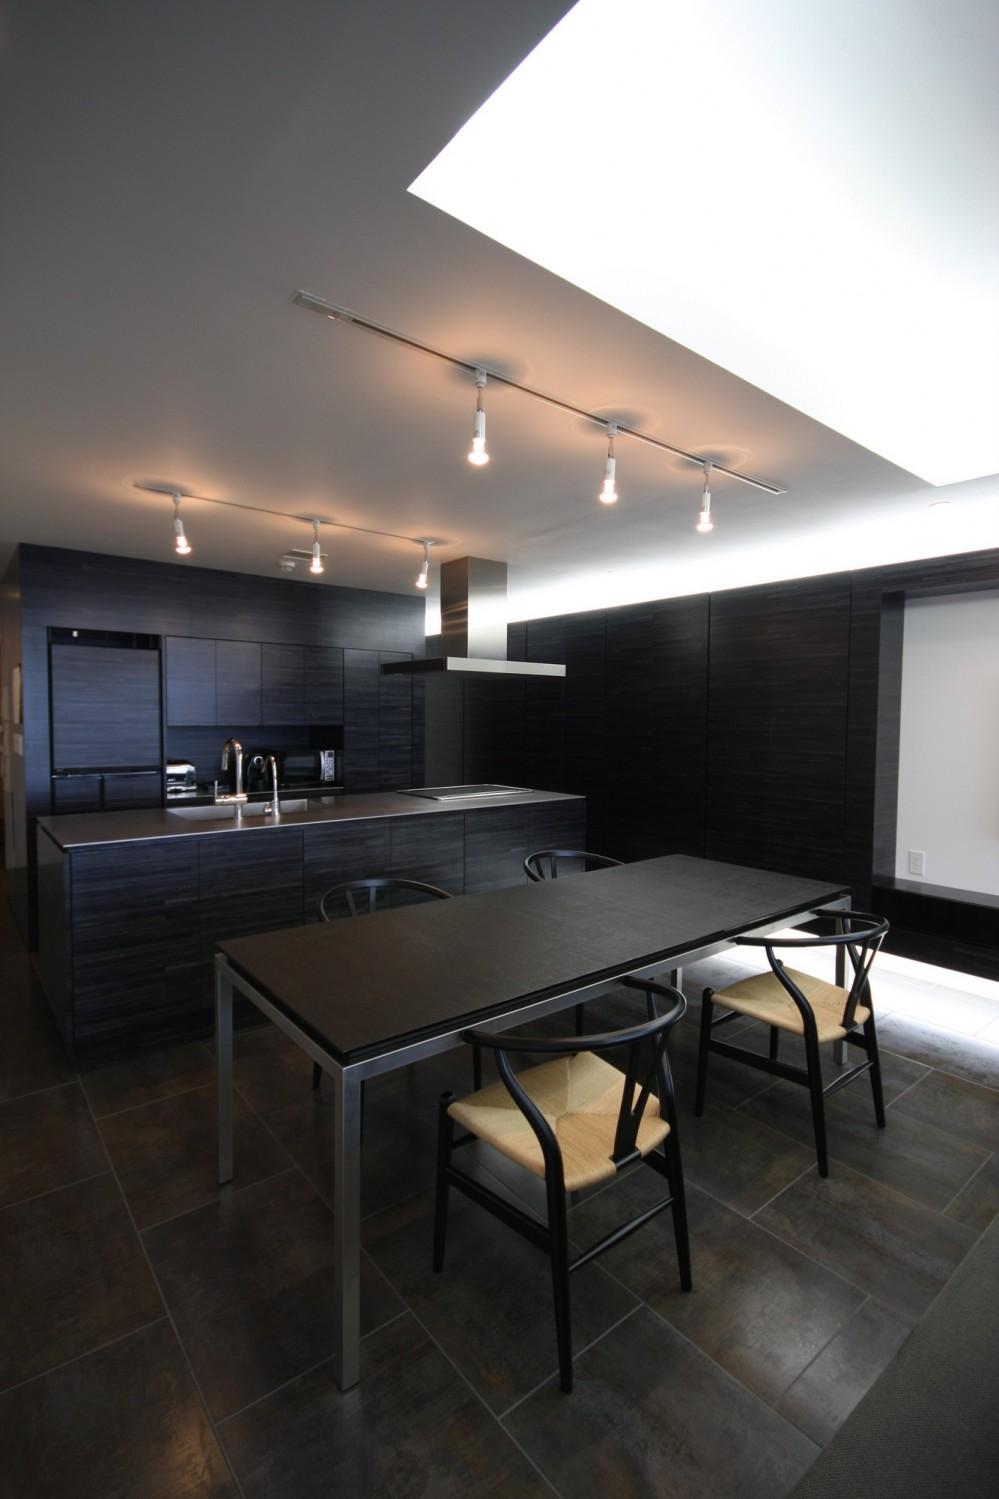 TAPO 富岡建築計画事務所「熱海Kヴィラ 伊豆山に建つリゾートマンションのリノベーション」